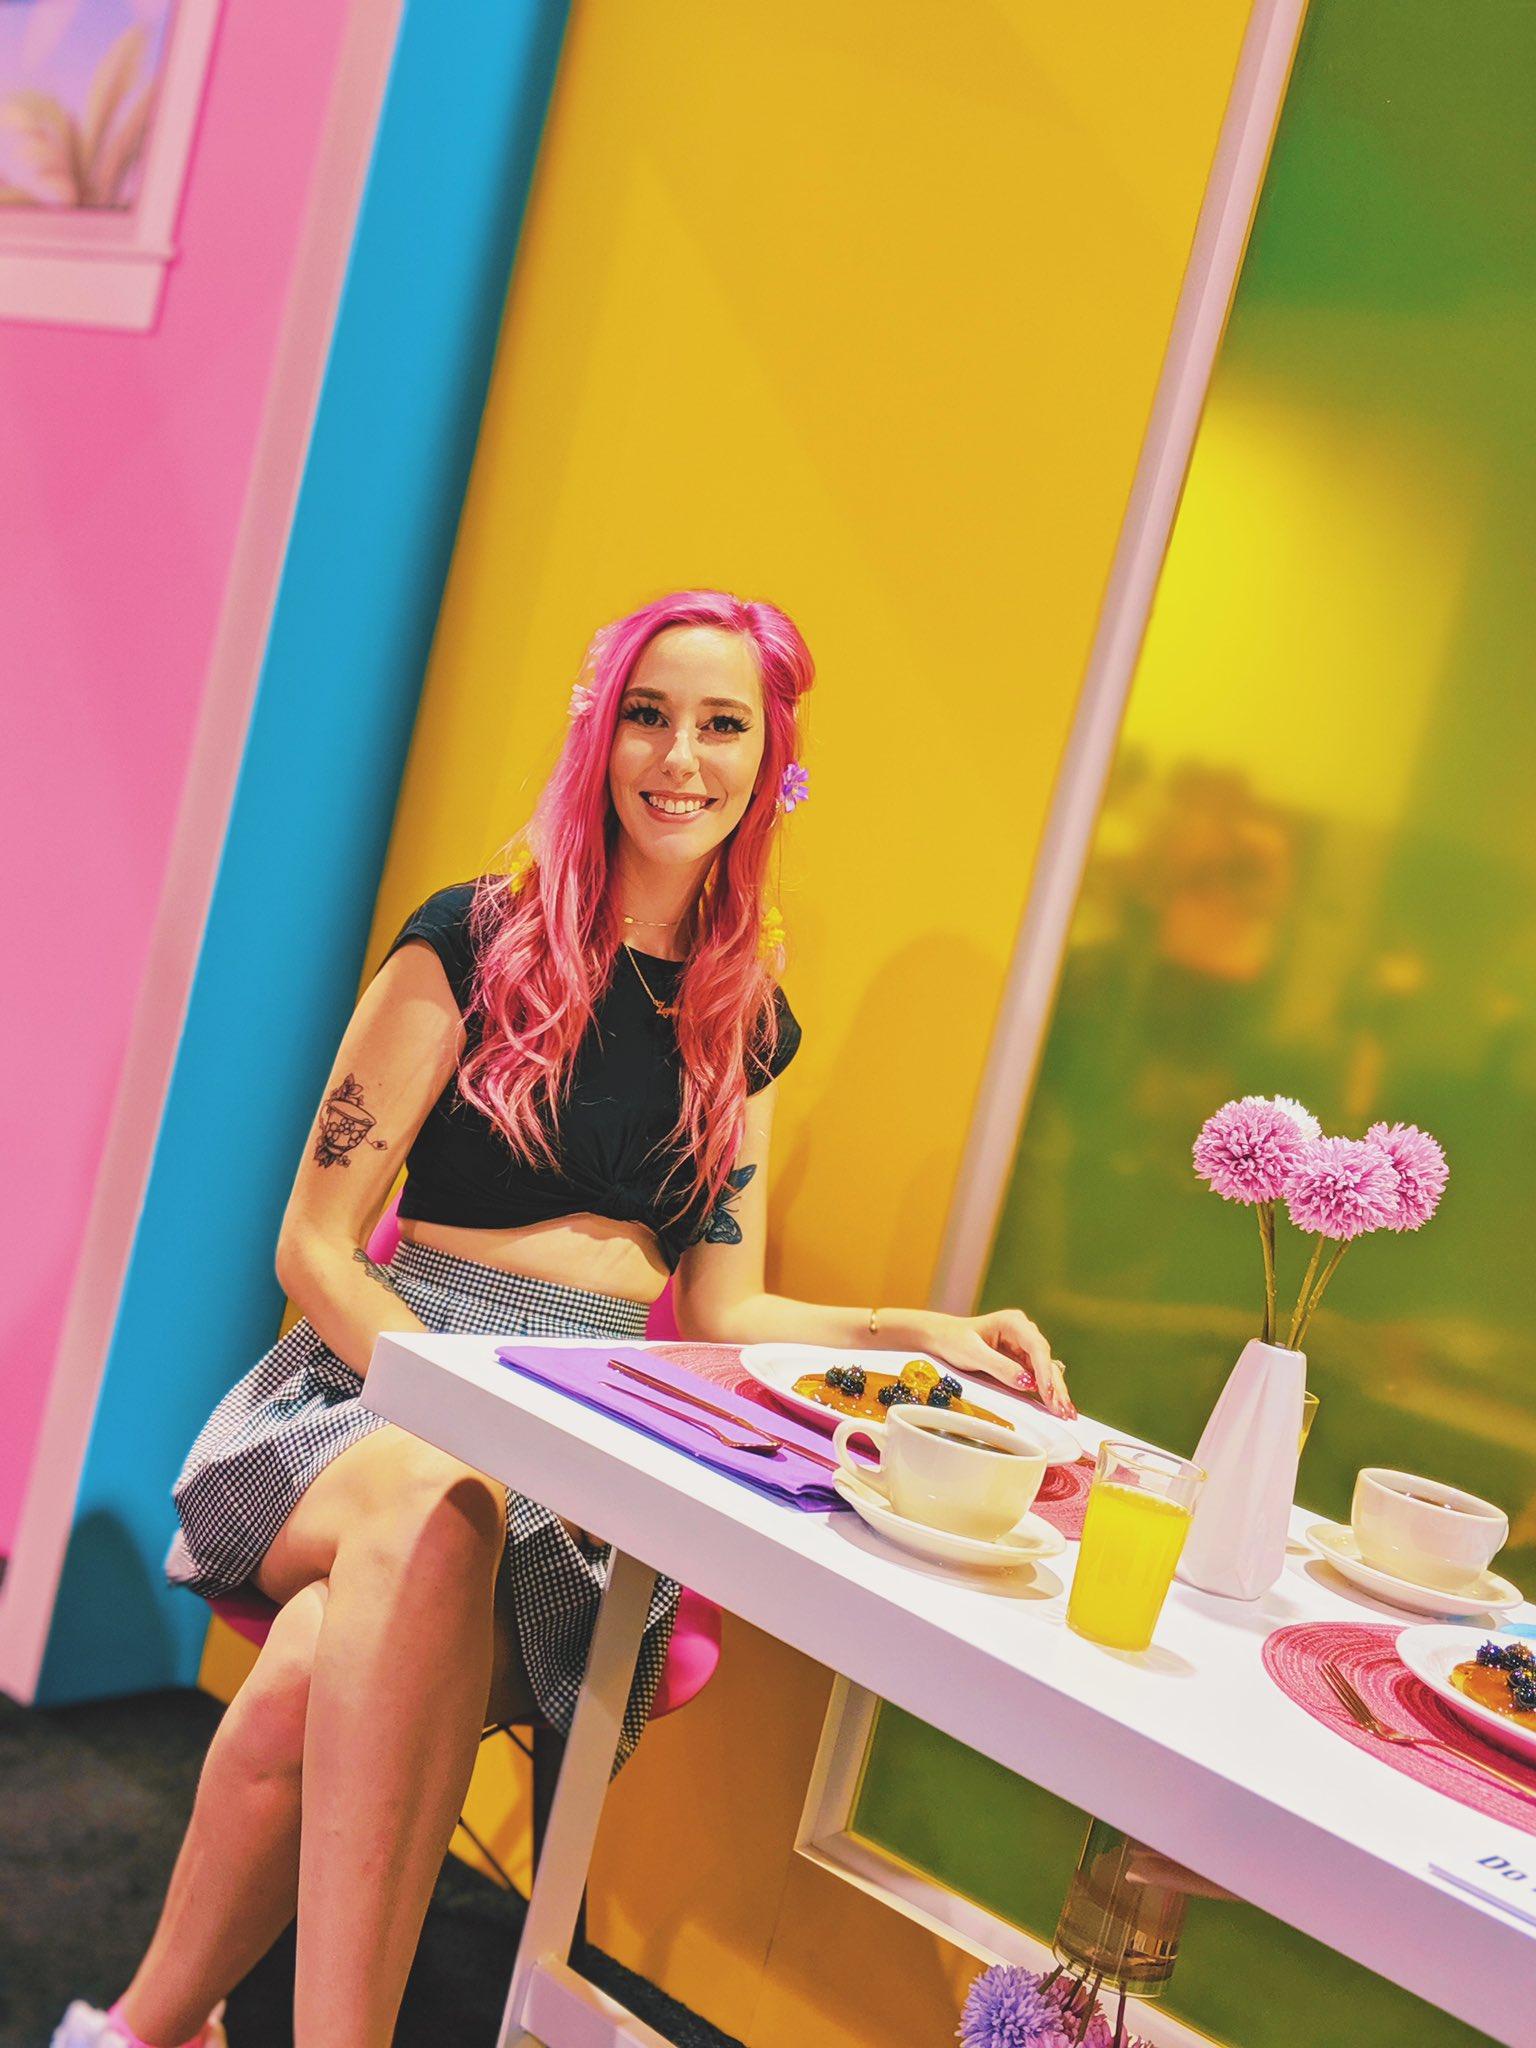 Meganplays On Twitter Had So Much Fun In The Barbie Dream